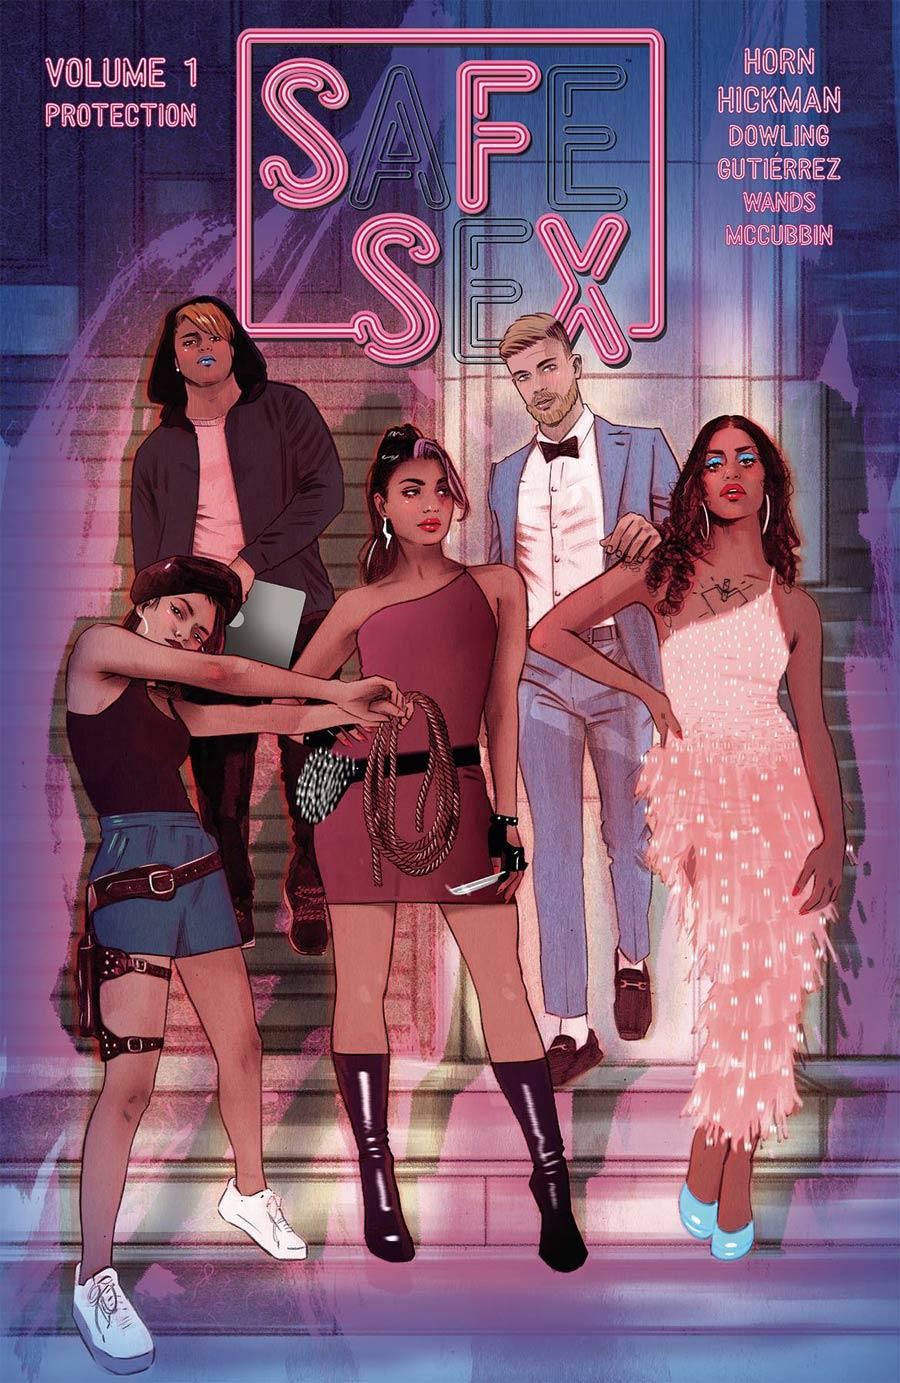 SFSX (Safe Sex) Vol 1 Protection TP